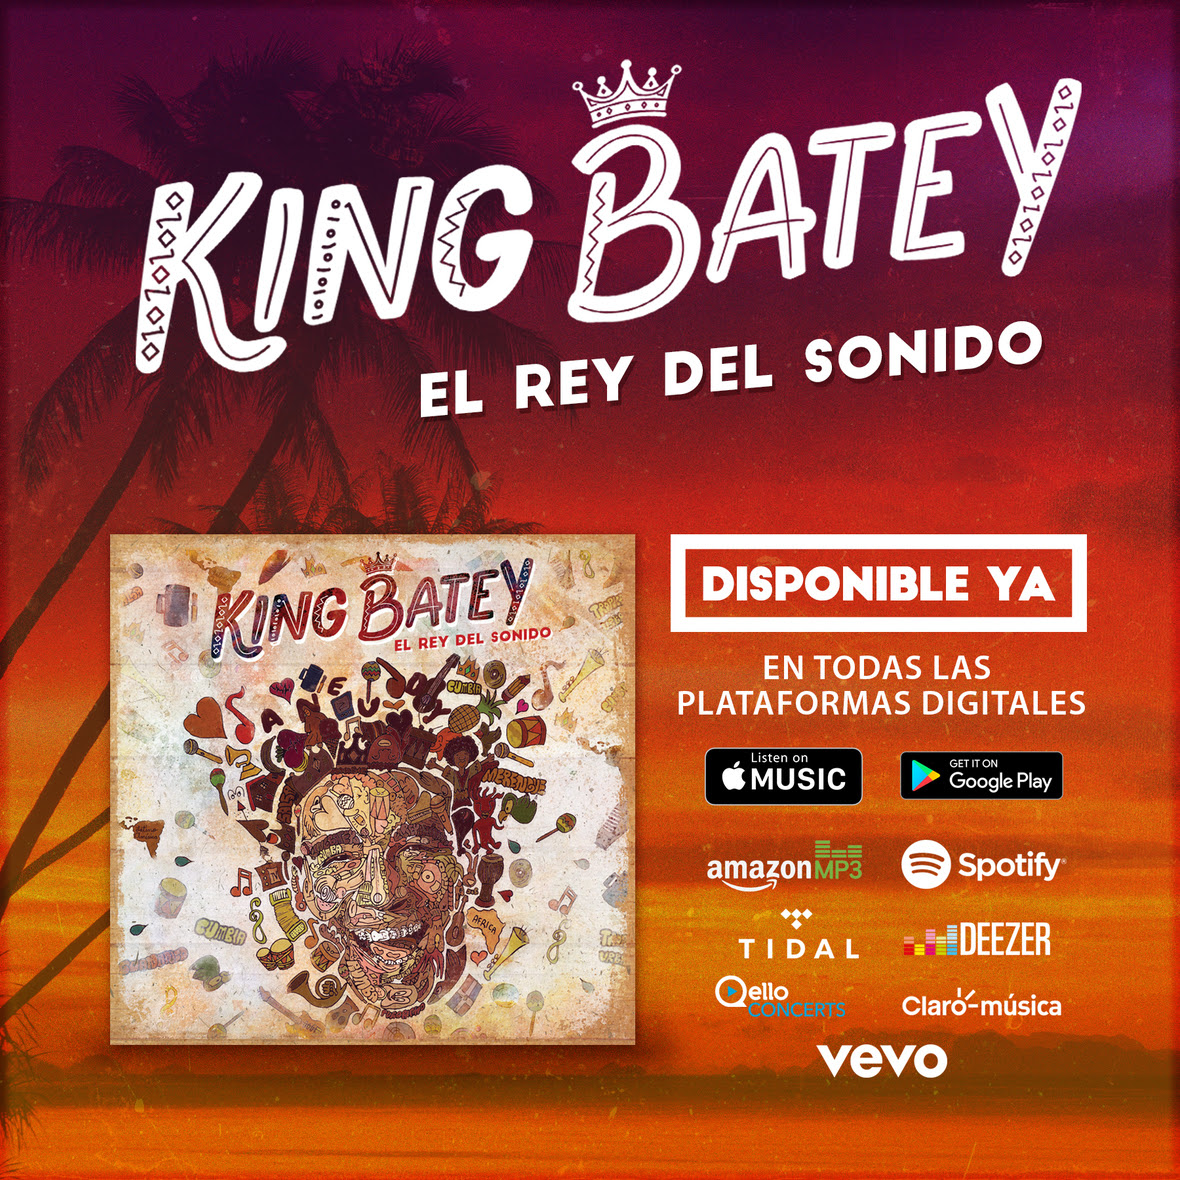 King Batey Album Release